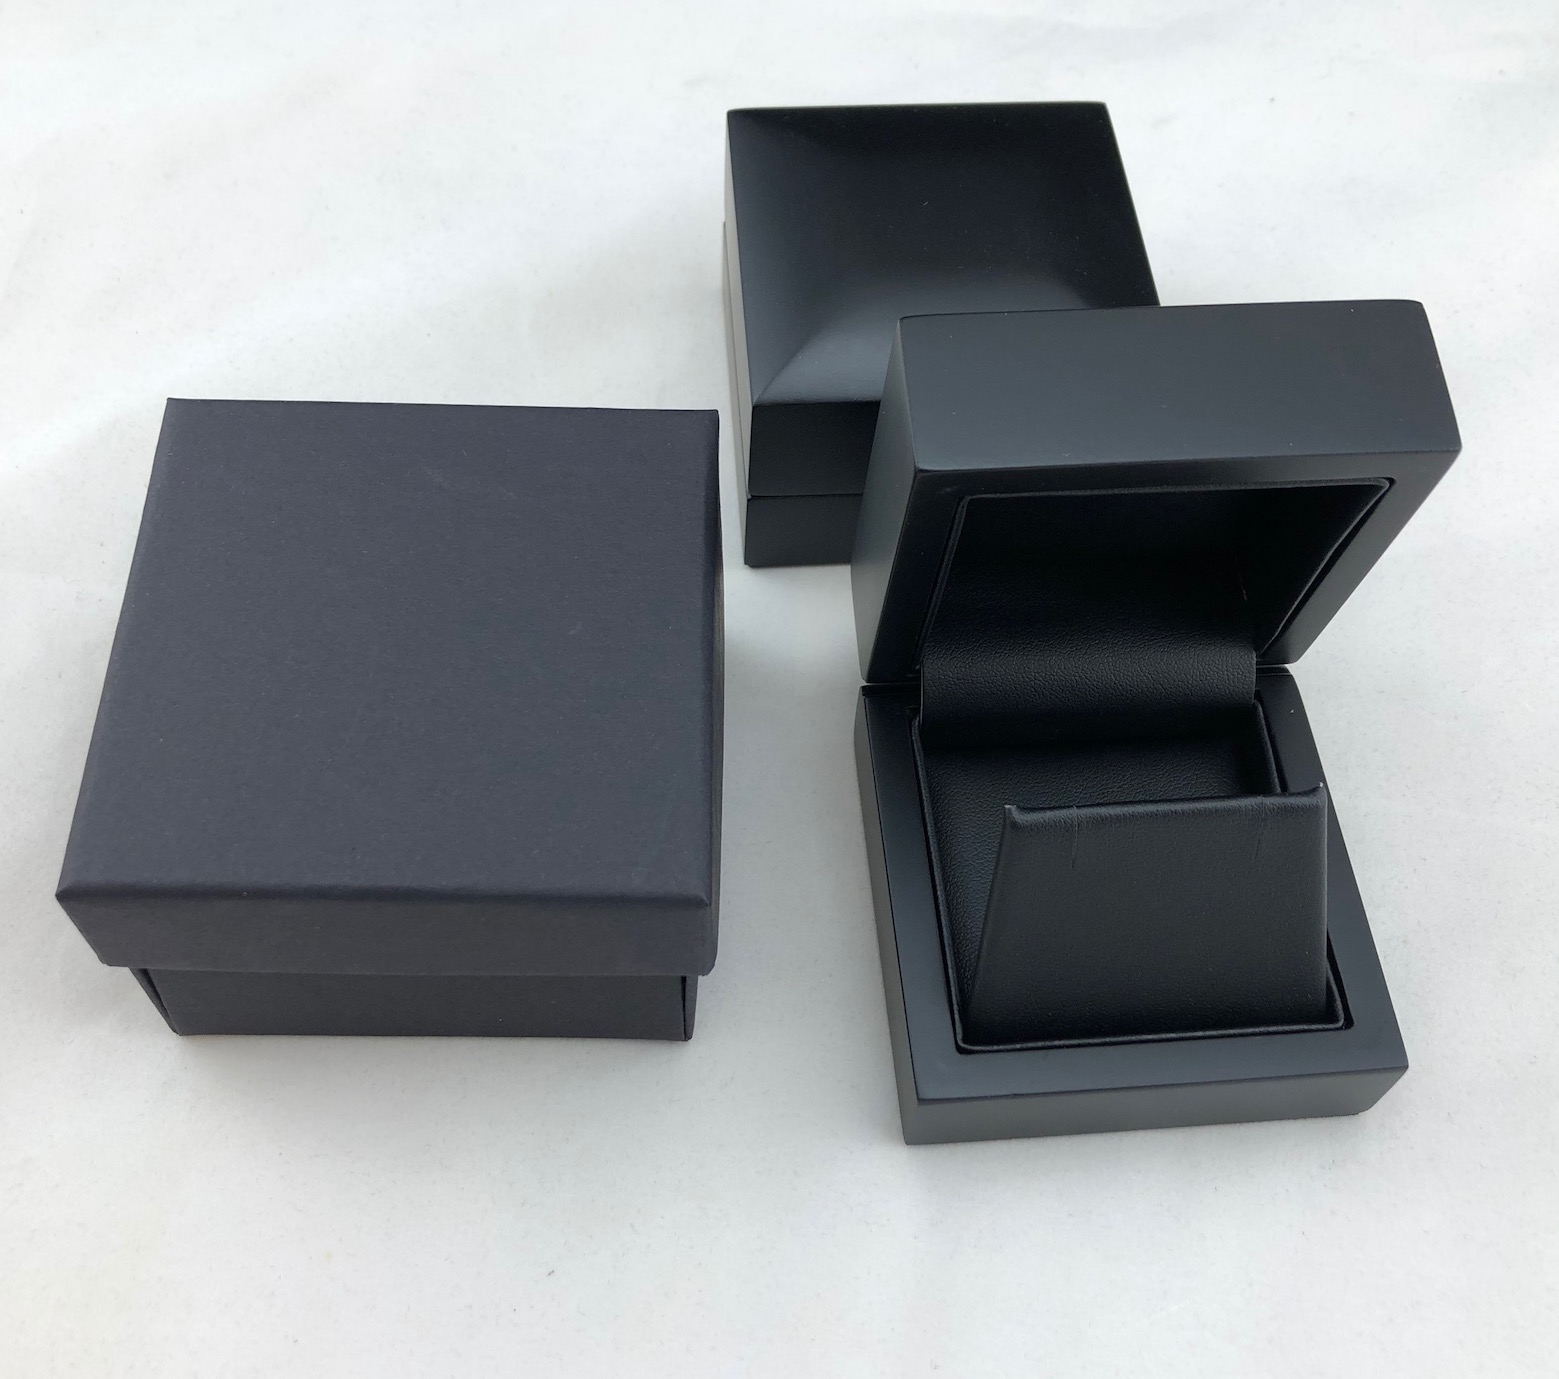 Midnight Elegance Earring Box & 2-piece packer